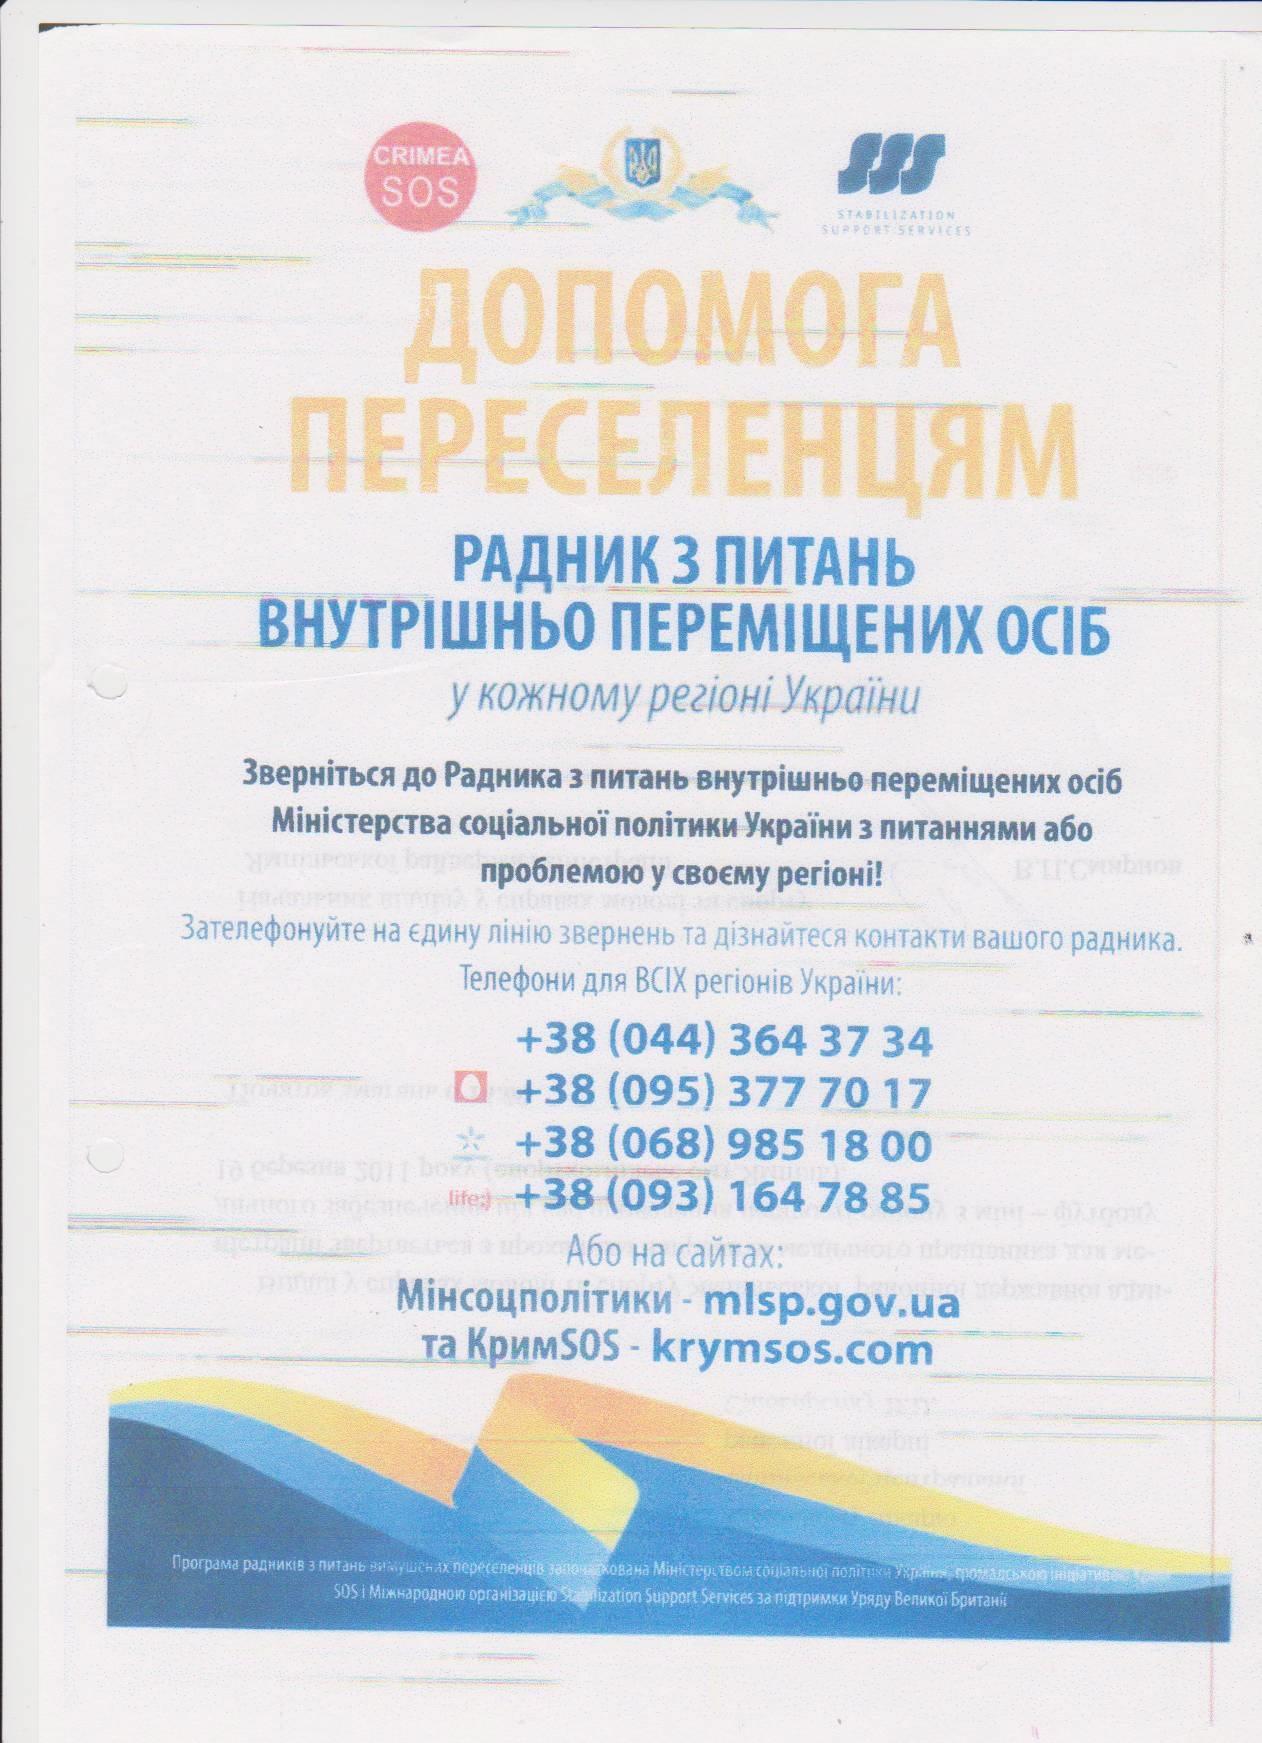 http://druzba2.at.ua/111/bezymjannyj.jpg